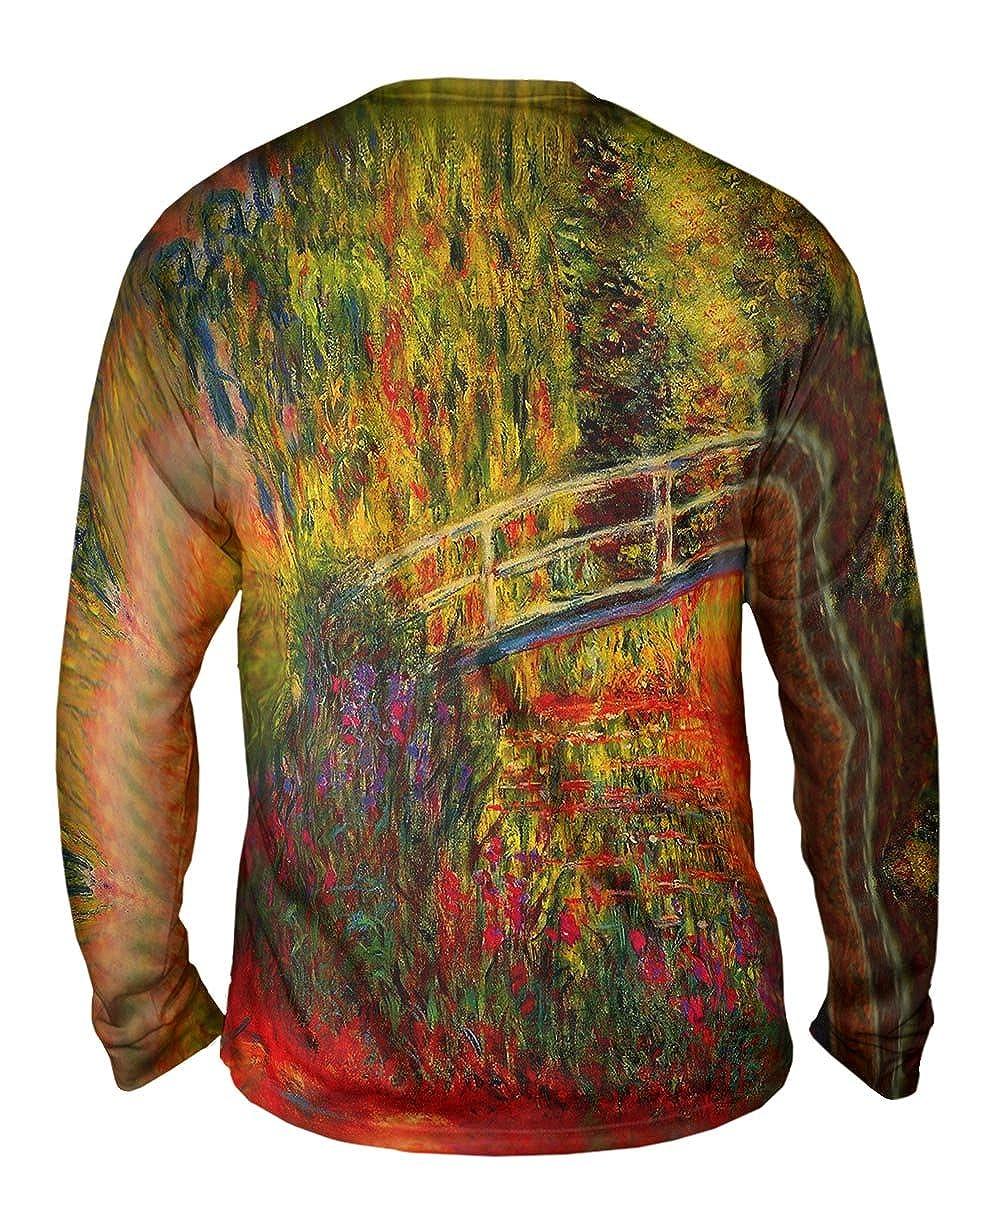 Mens Long Sleeve 1900 Water Lily Pond Yizzam -TShirt Monet